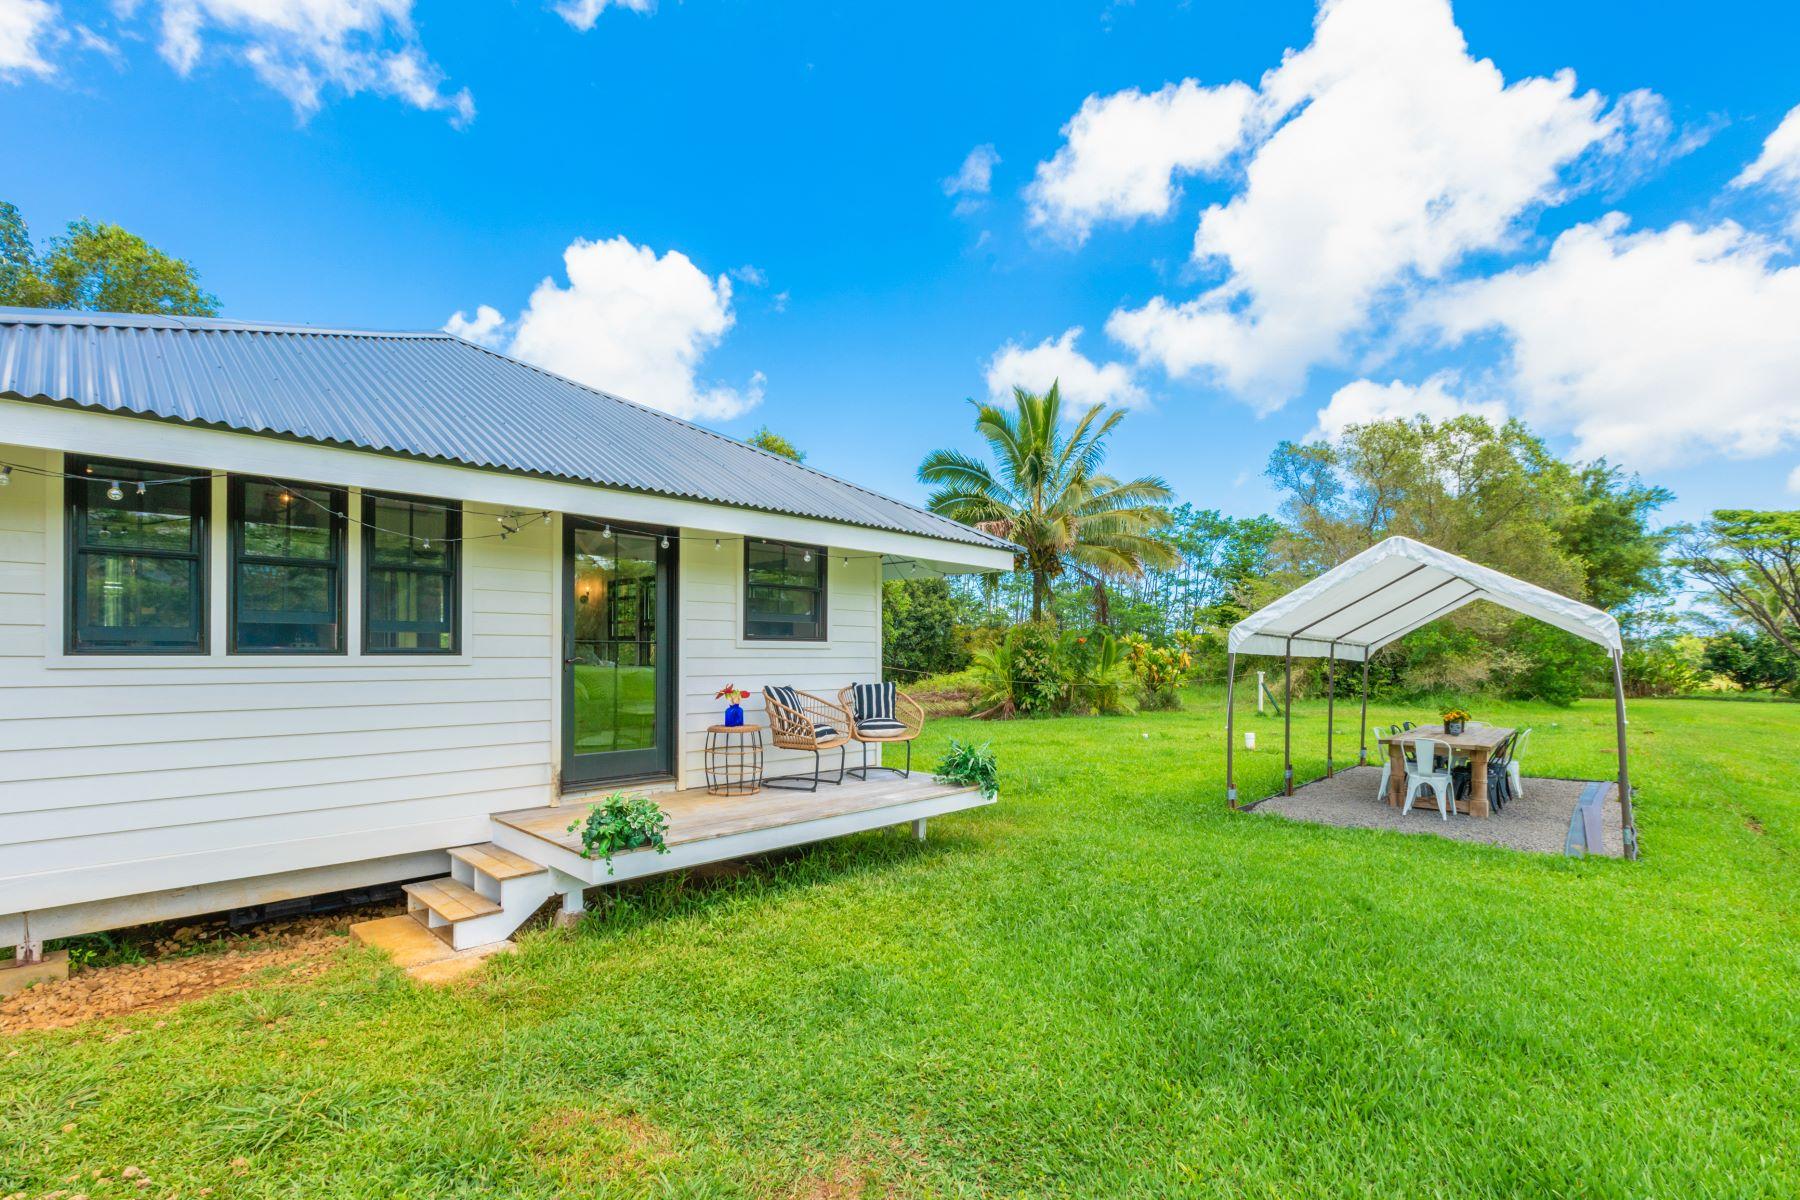 Single Family Homes for Active at Aloha Wai 6240 Kahiliholo Road #B Kilauea, Hawaii 96722 United States